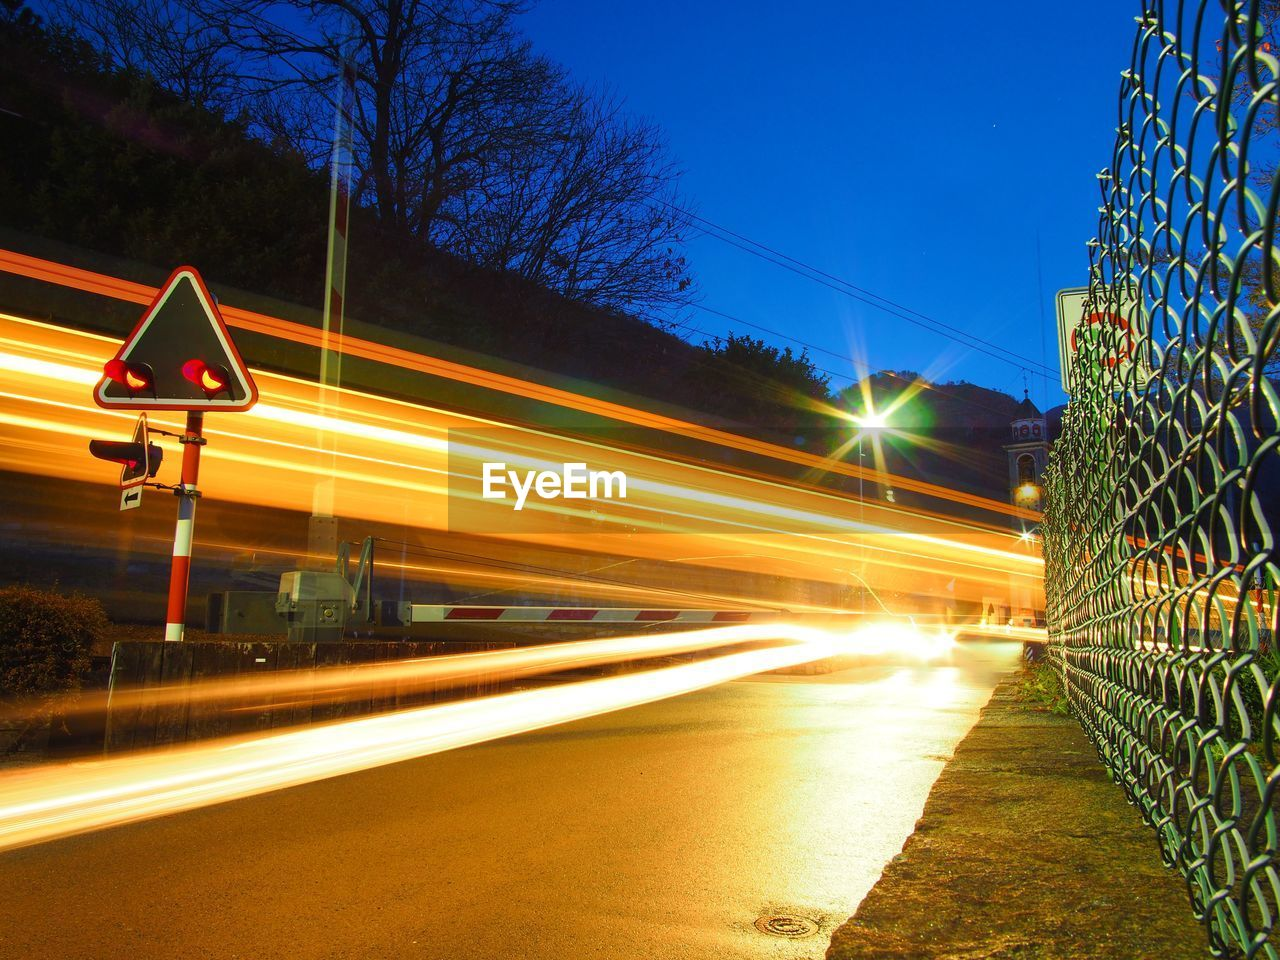 ILLUMINATED LIGHT TRAILS ON HIGHWAY AT NIGHT